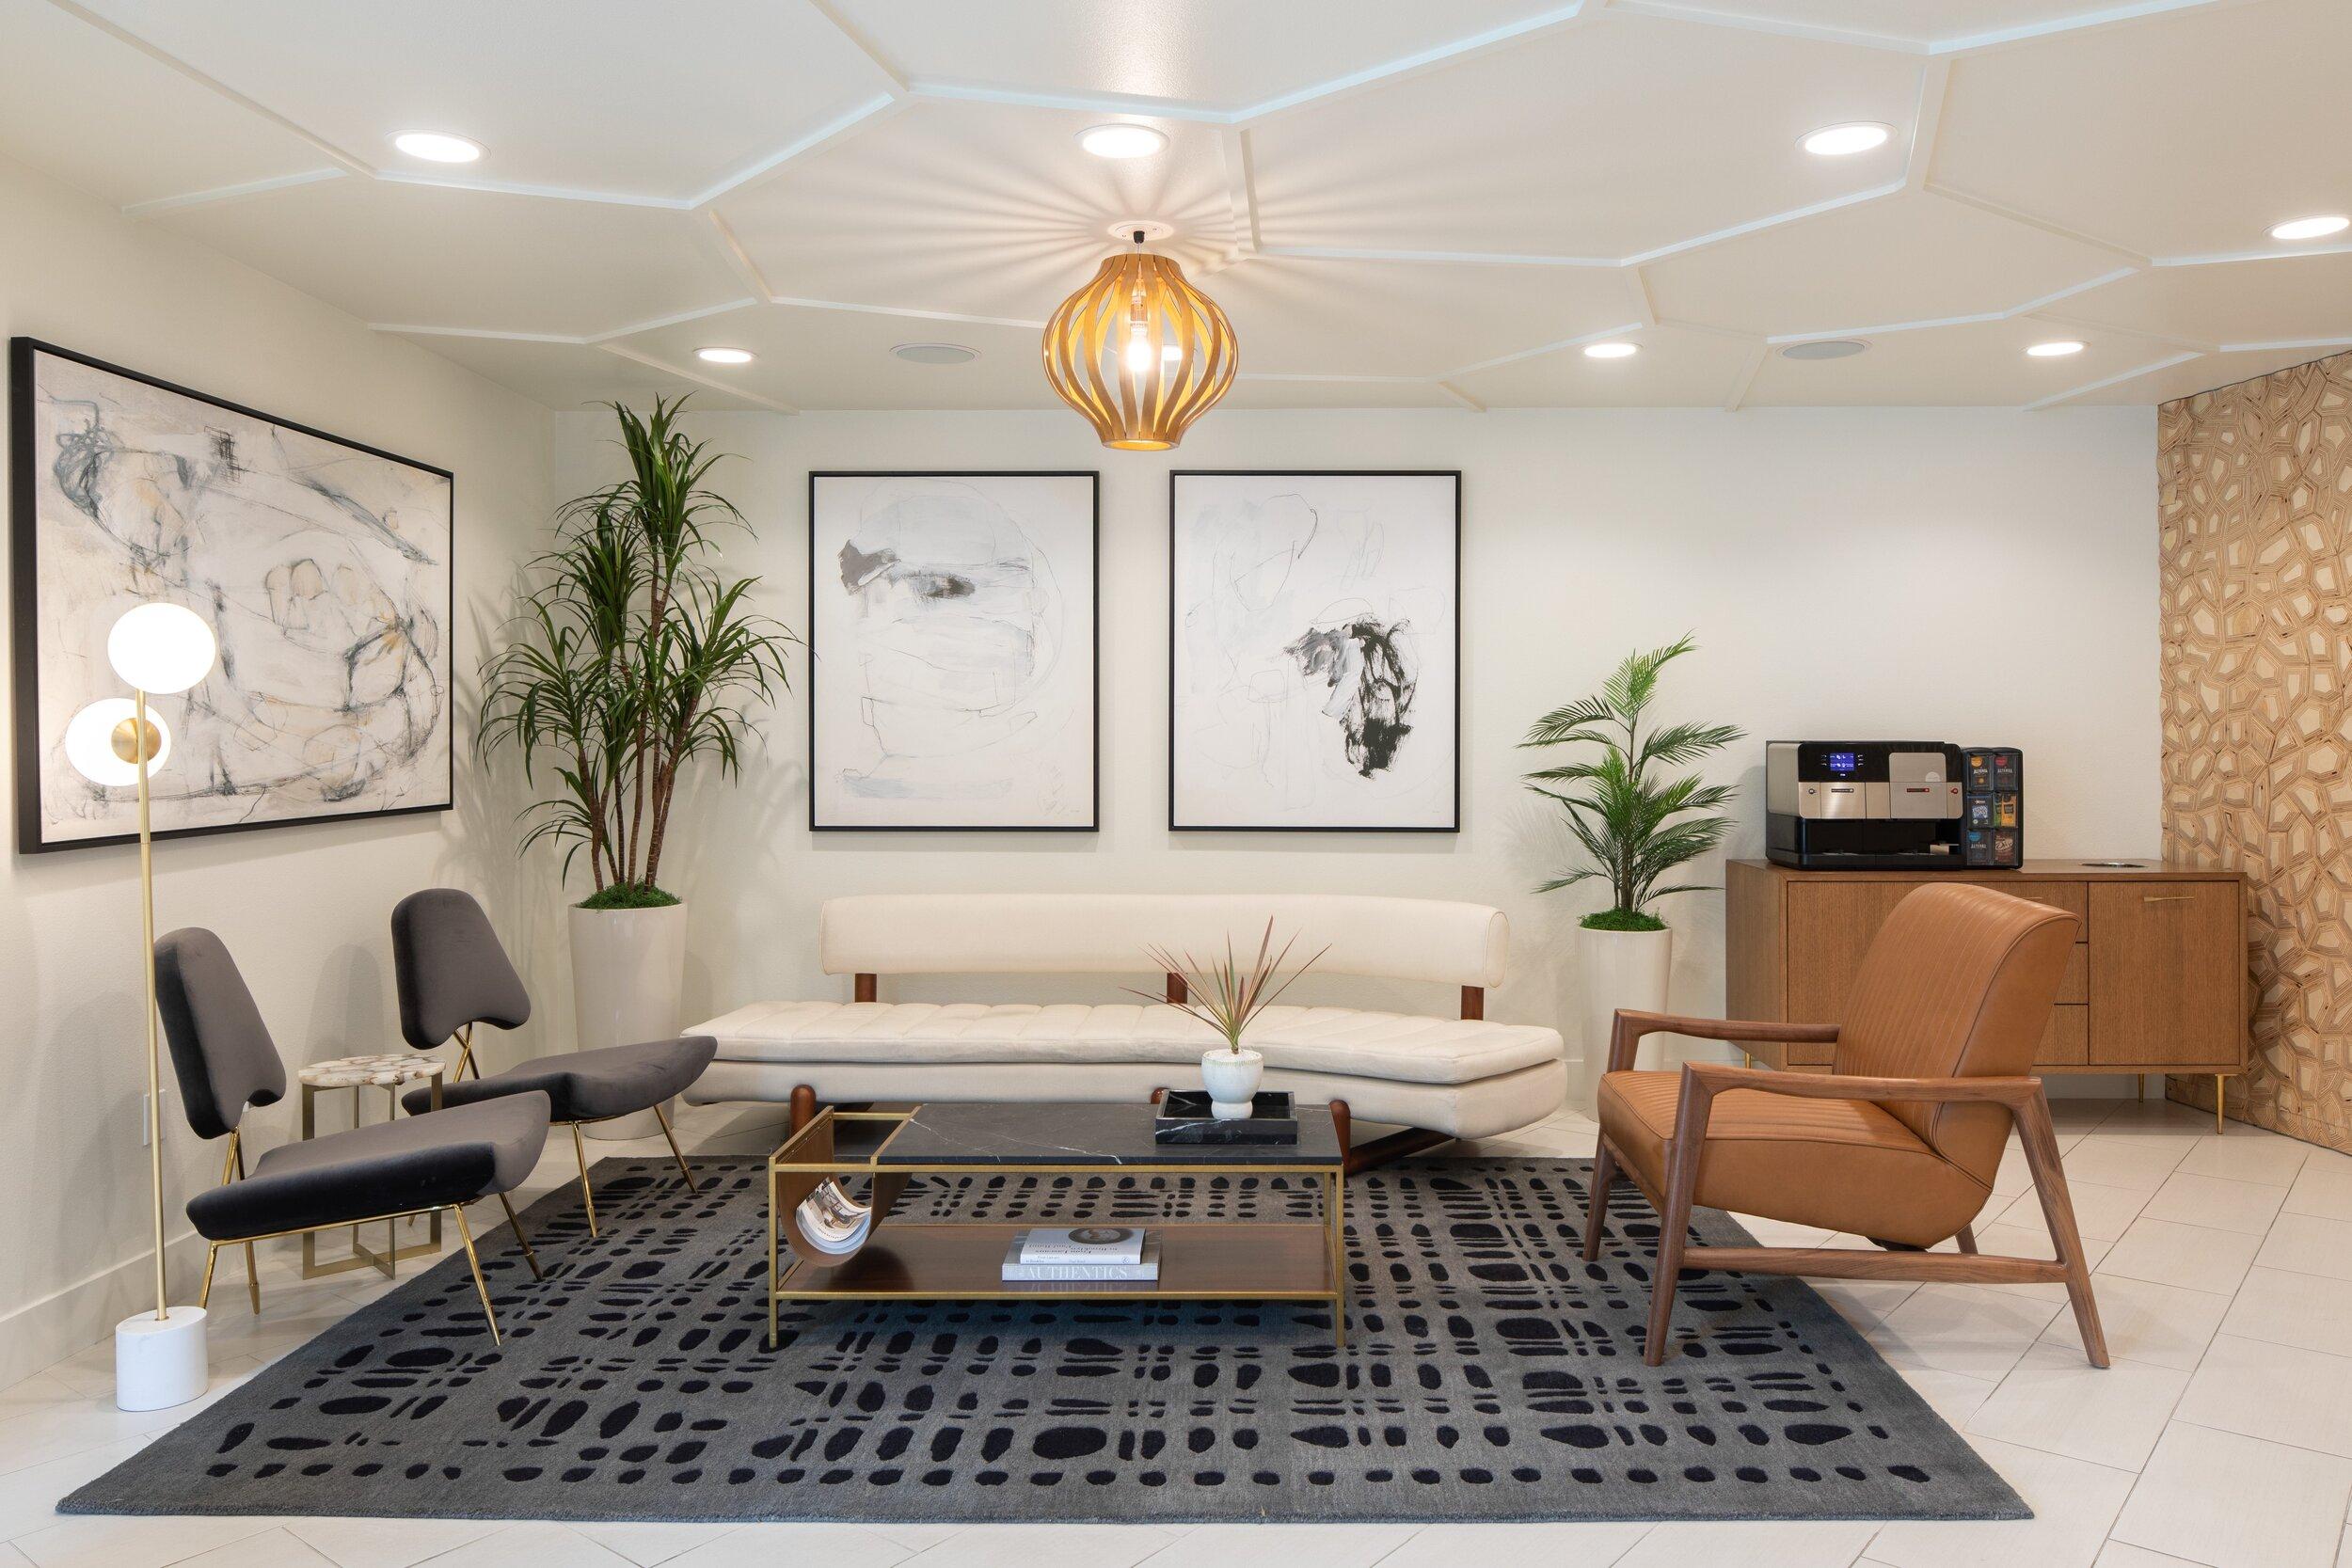 prisma apartments - Client: Wood PartnersType: Multi-FamilyLocation: Santa Ana, CAStatus: Completed